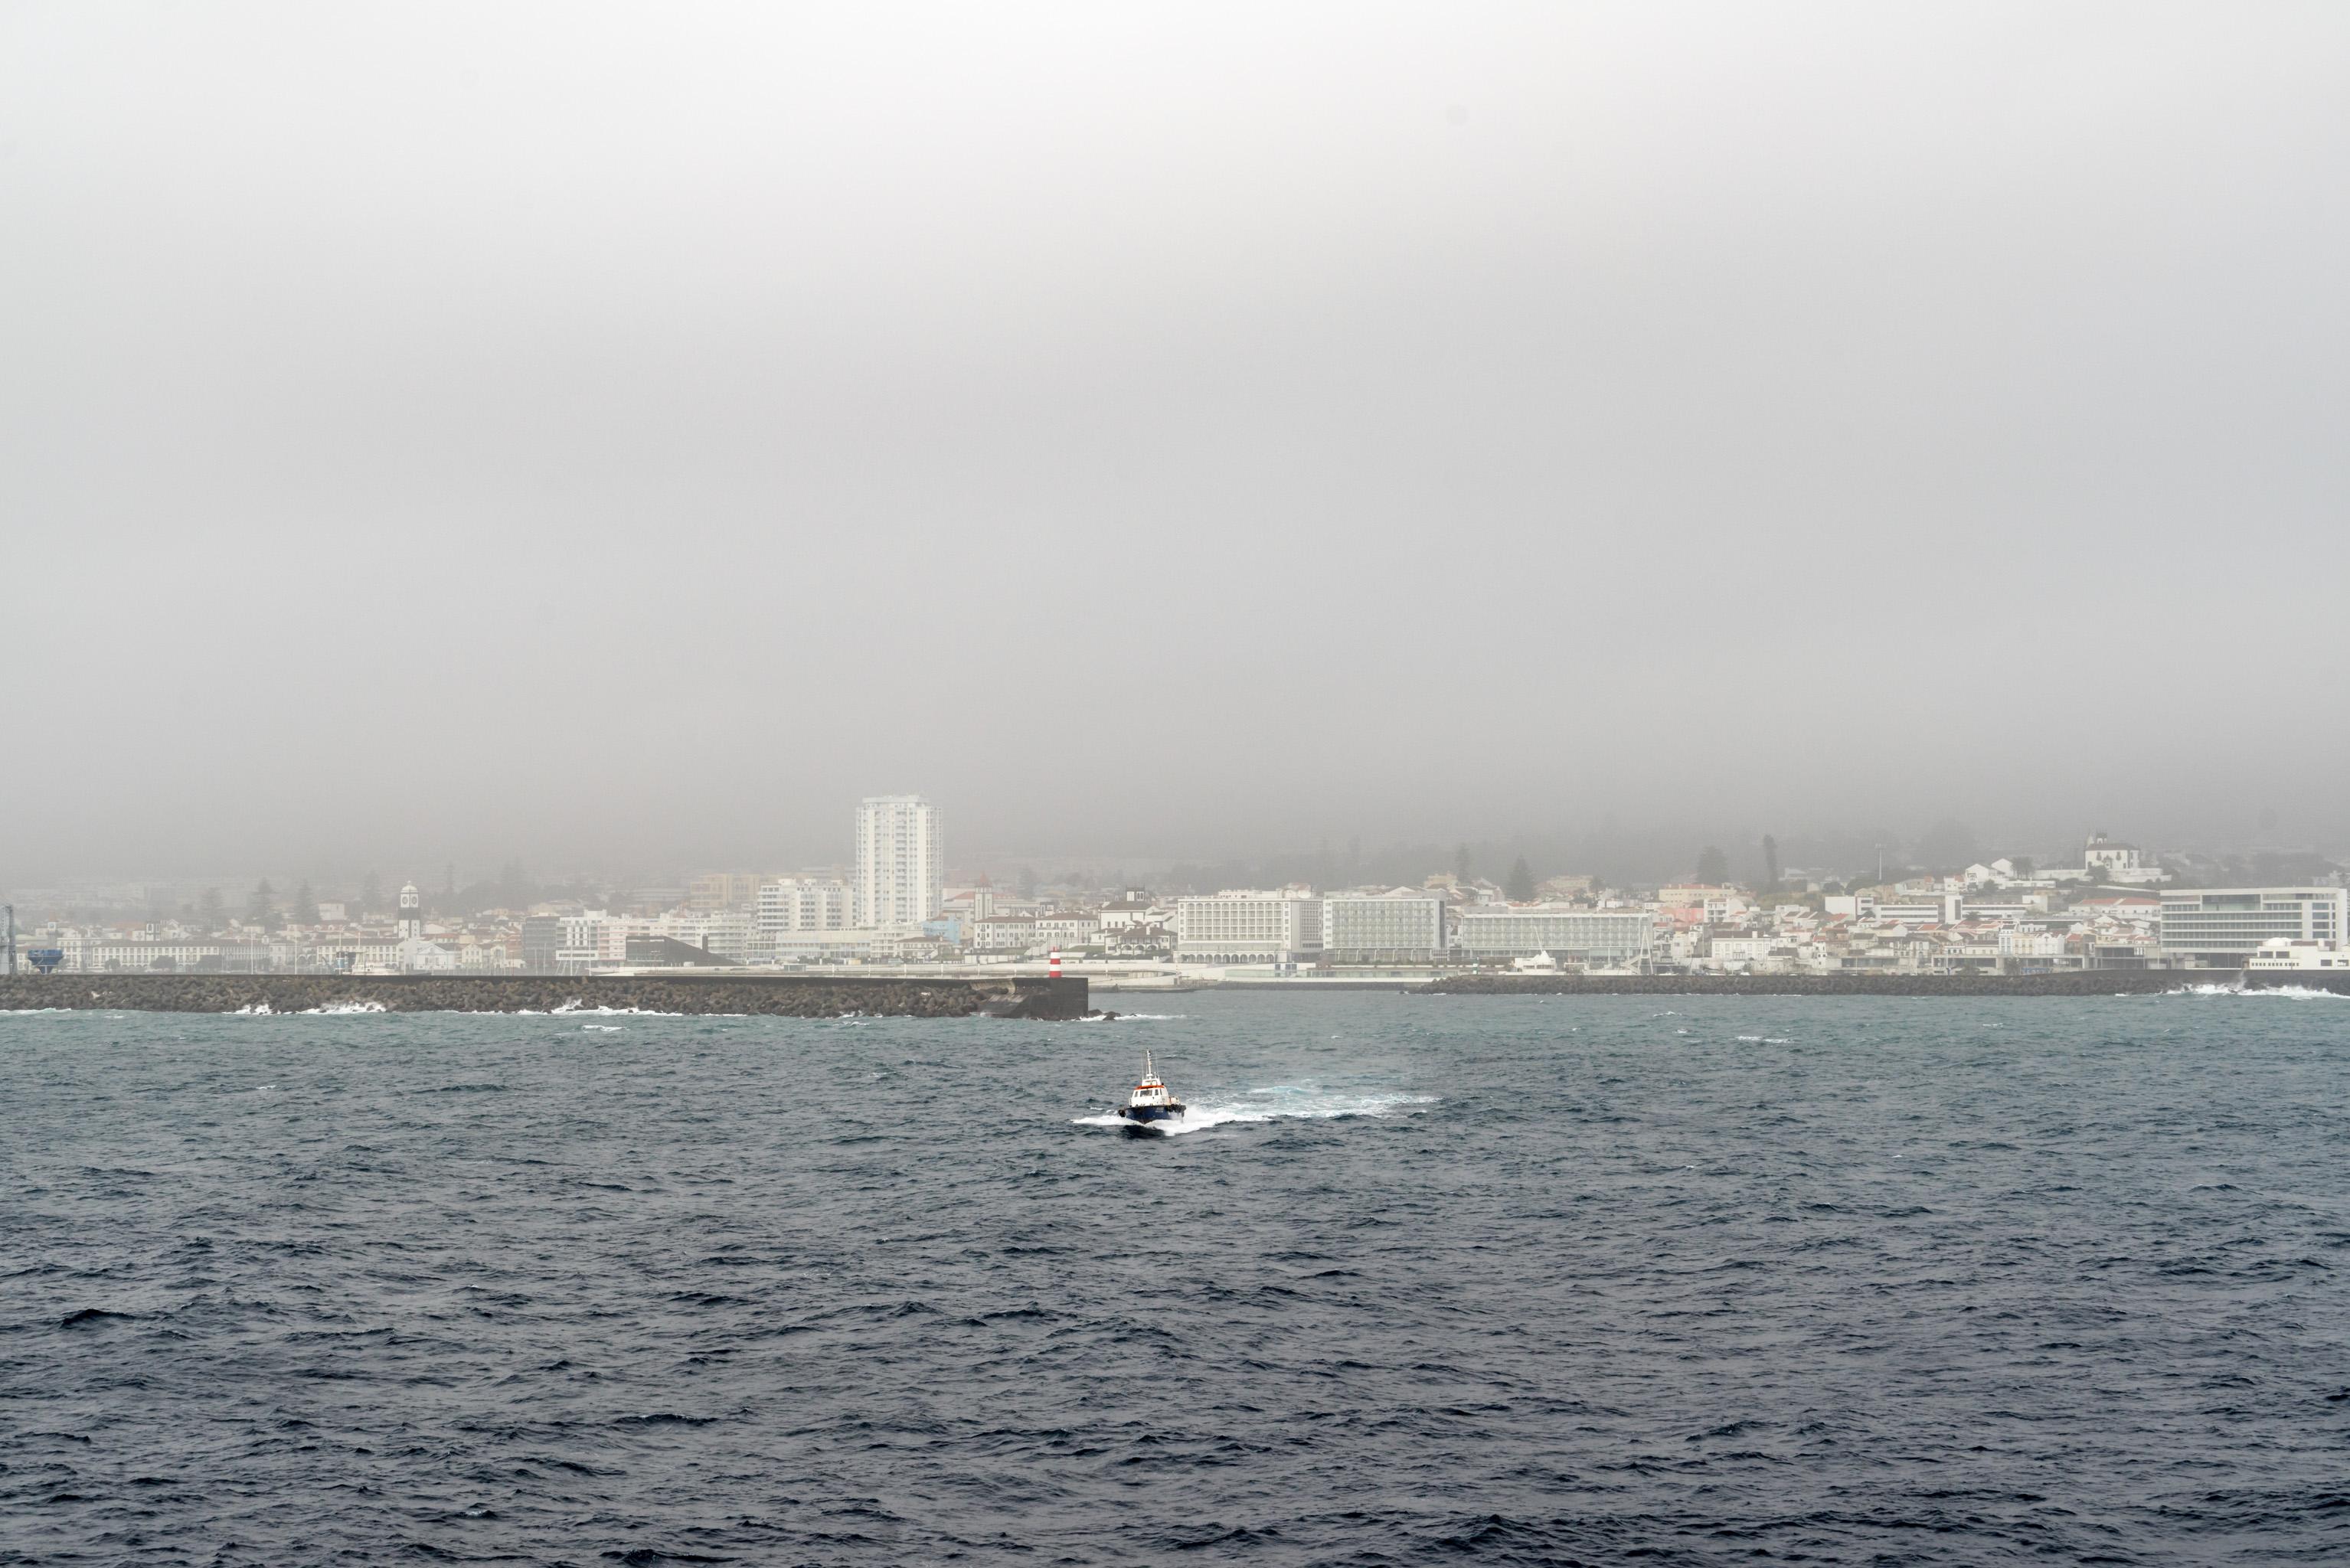 Transit: Azoren - São Miguel - Ponta Delgada